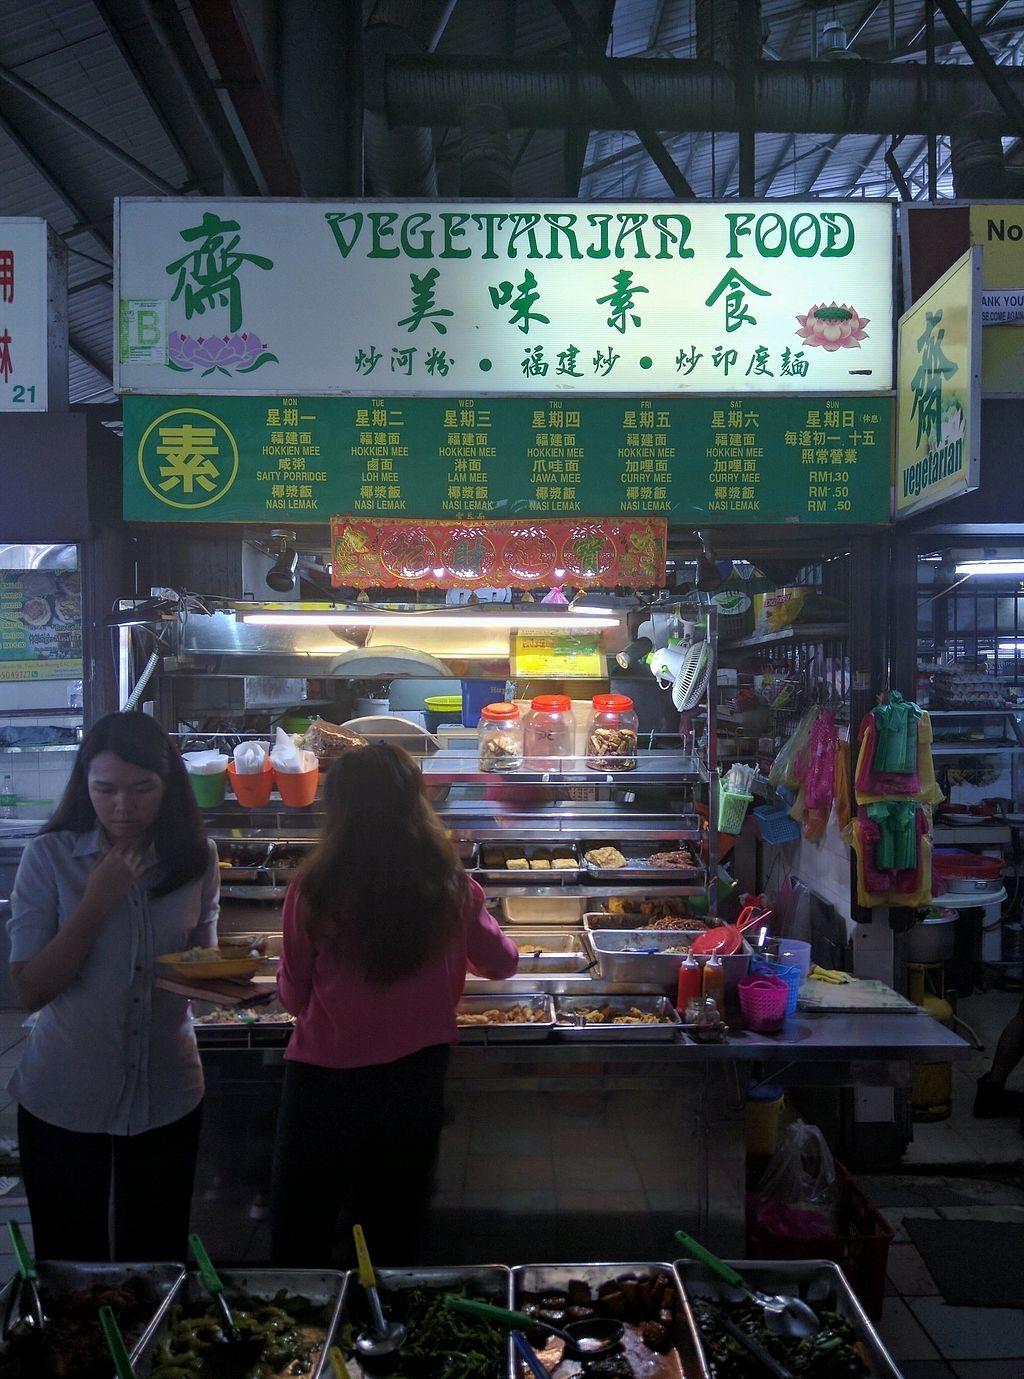 "Photo of Kompleks Sri Selera Bayan Baru - Vegetarian Stall  by <a href=""/members/profile/Summer_Tan"">Summer_Tan</a> <br/>The Stall <br/> February 2, 2018  - <a href='/contact/abuse/image/65929/354158'>Report</a>"